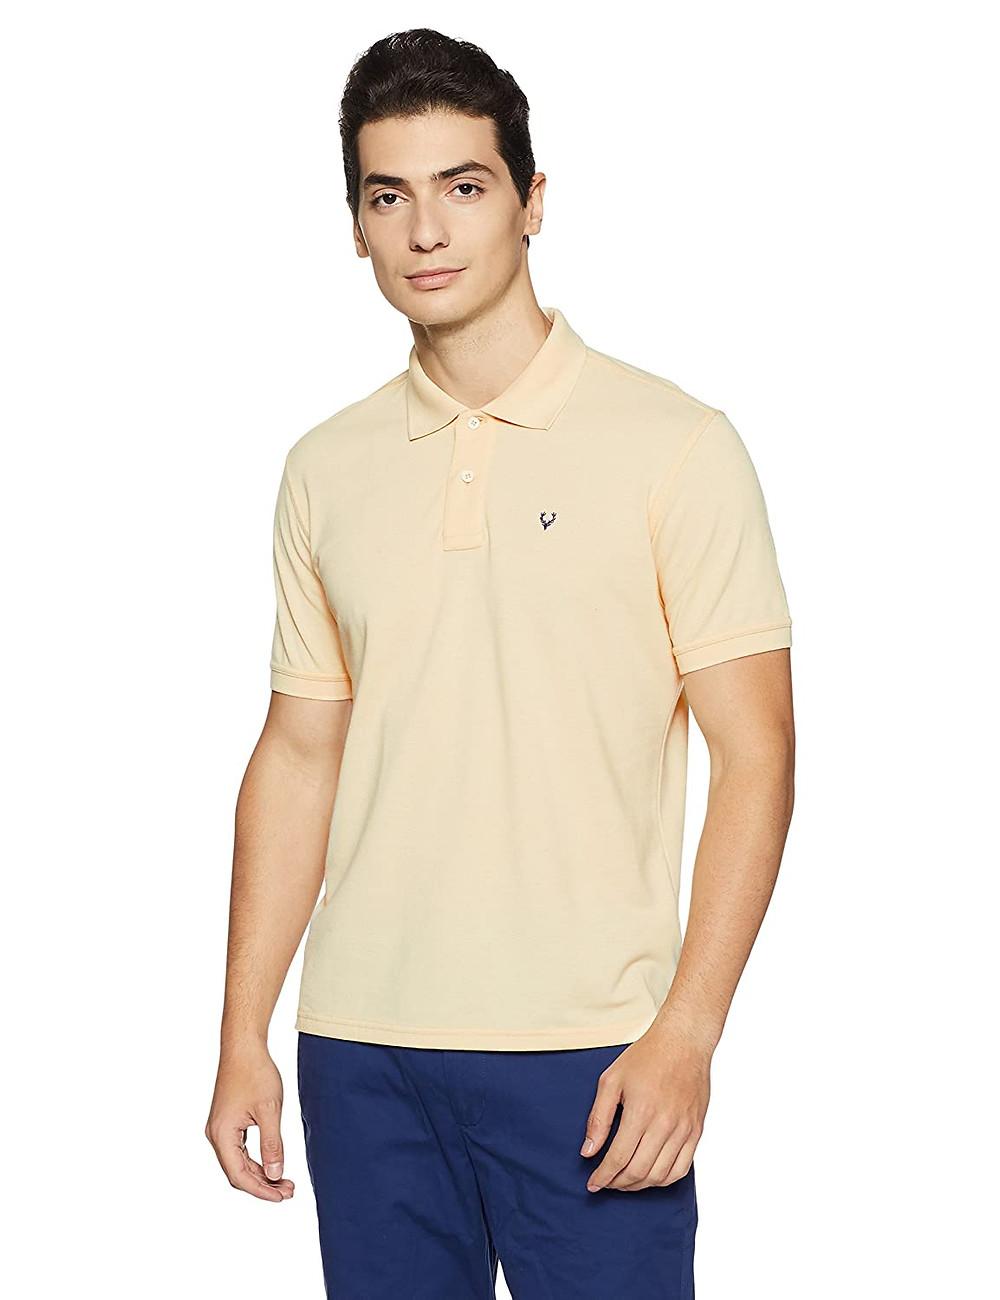 Dandyshirt men's shirt review